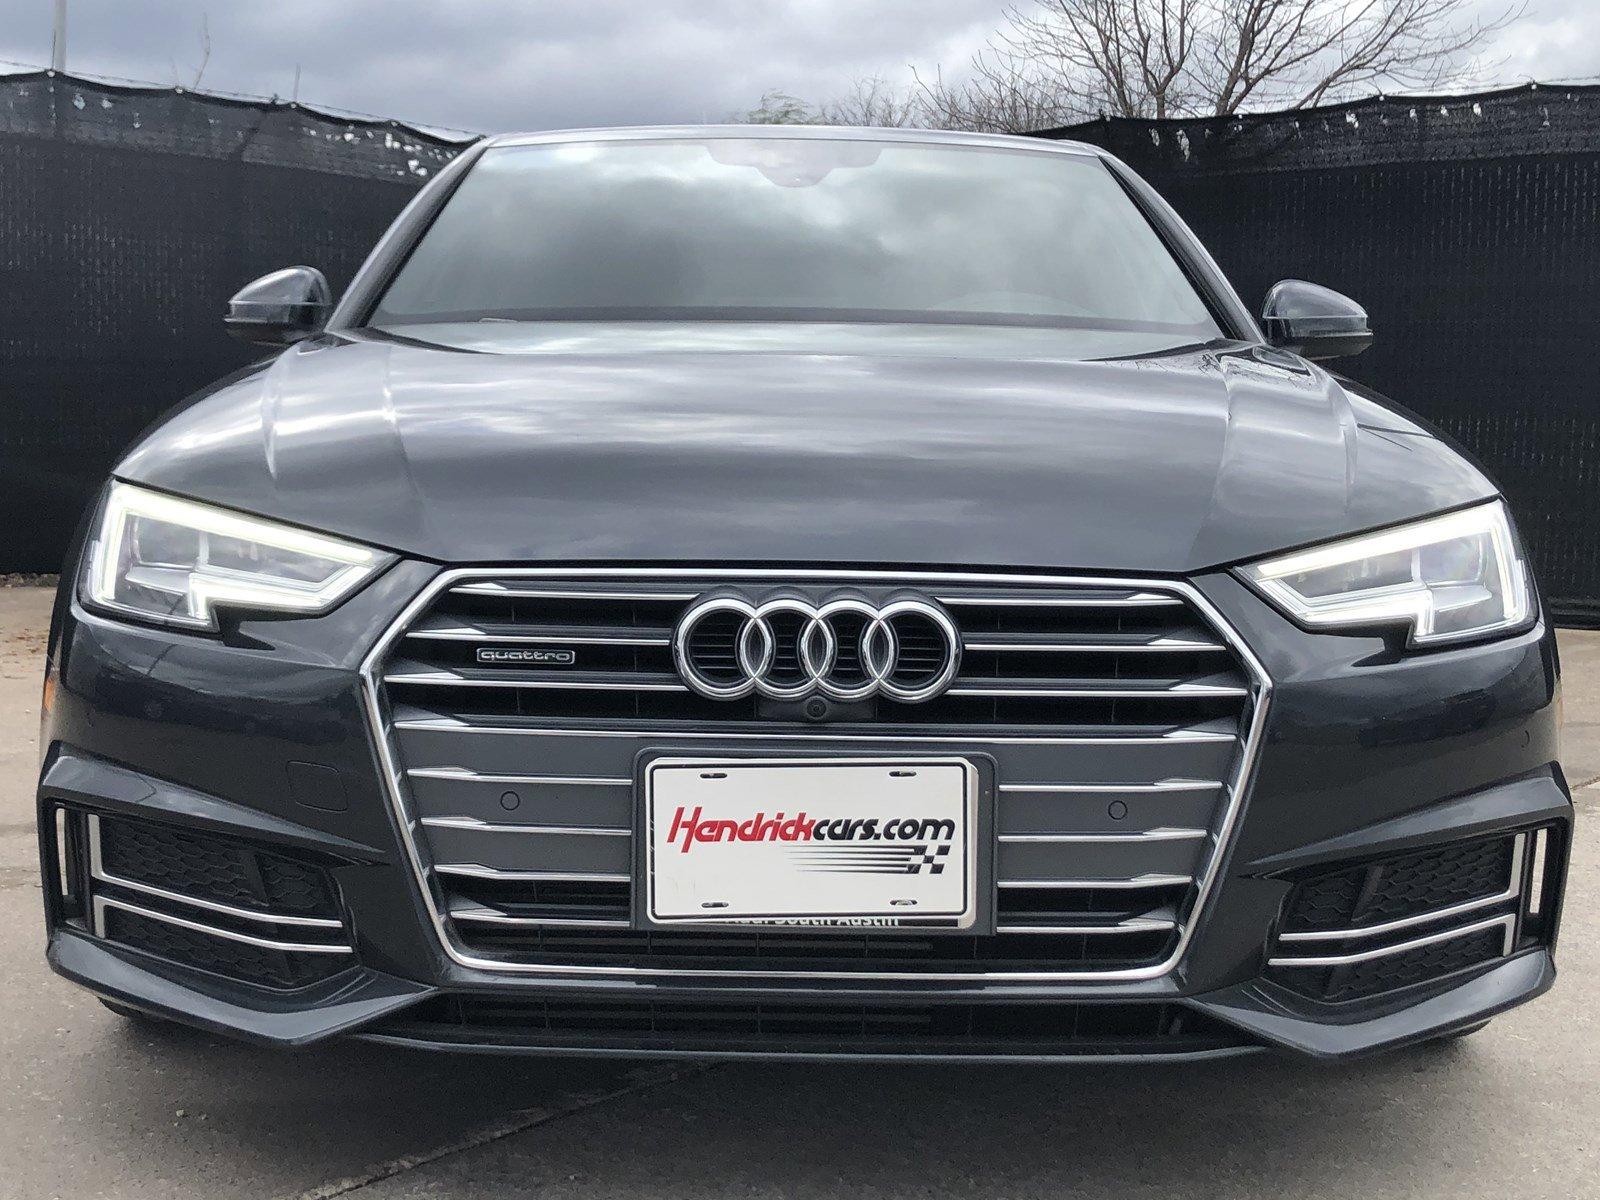 Pre-Owned 2017 Audi A4 Prestige